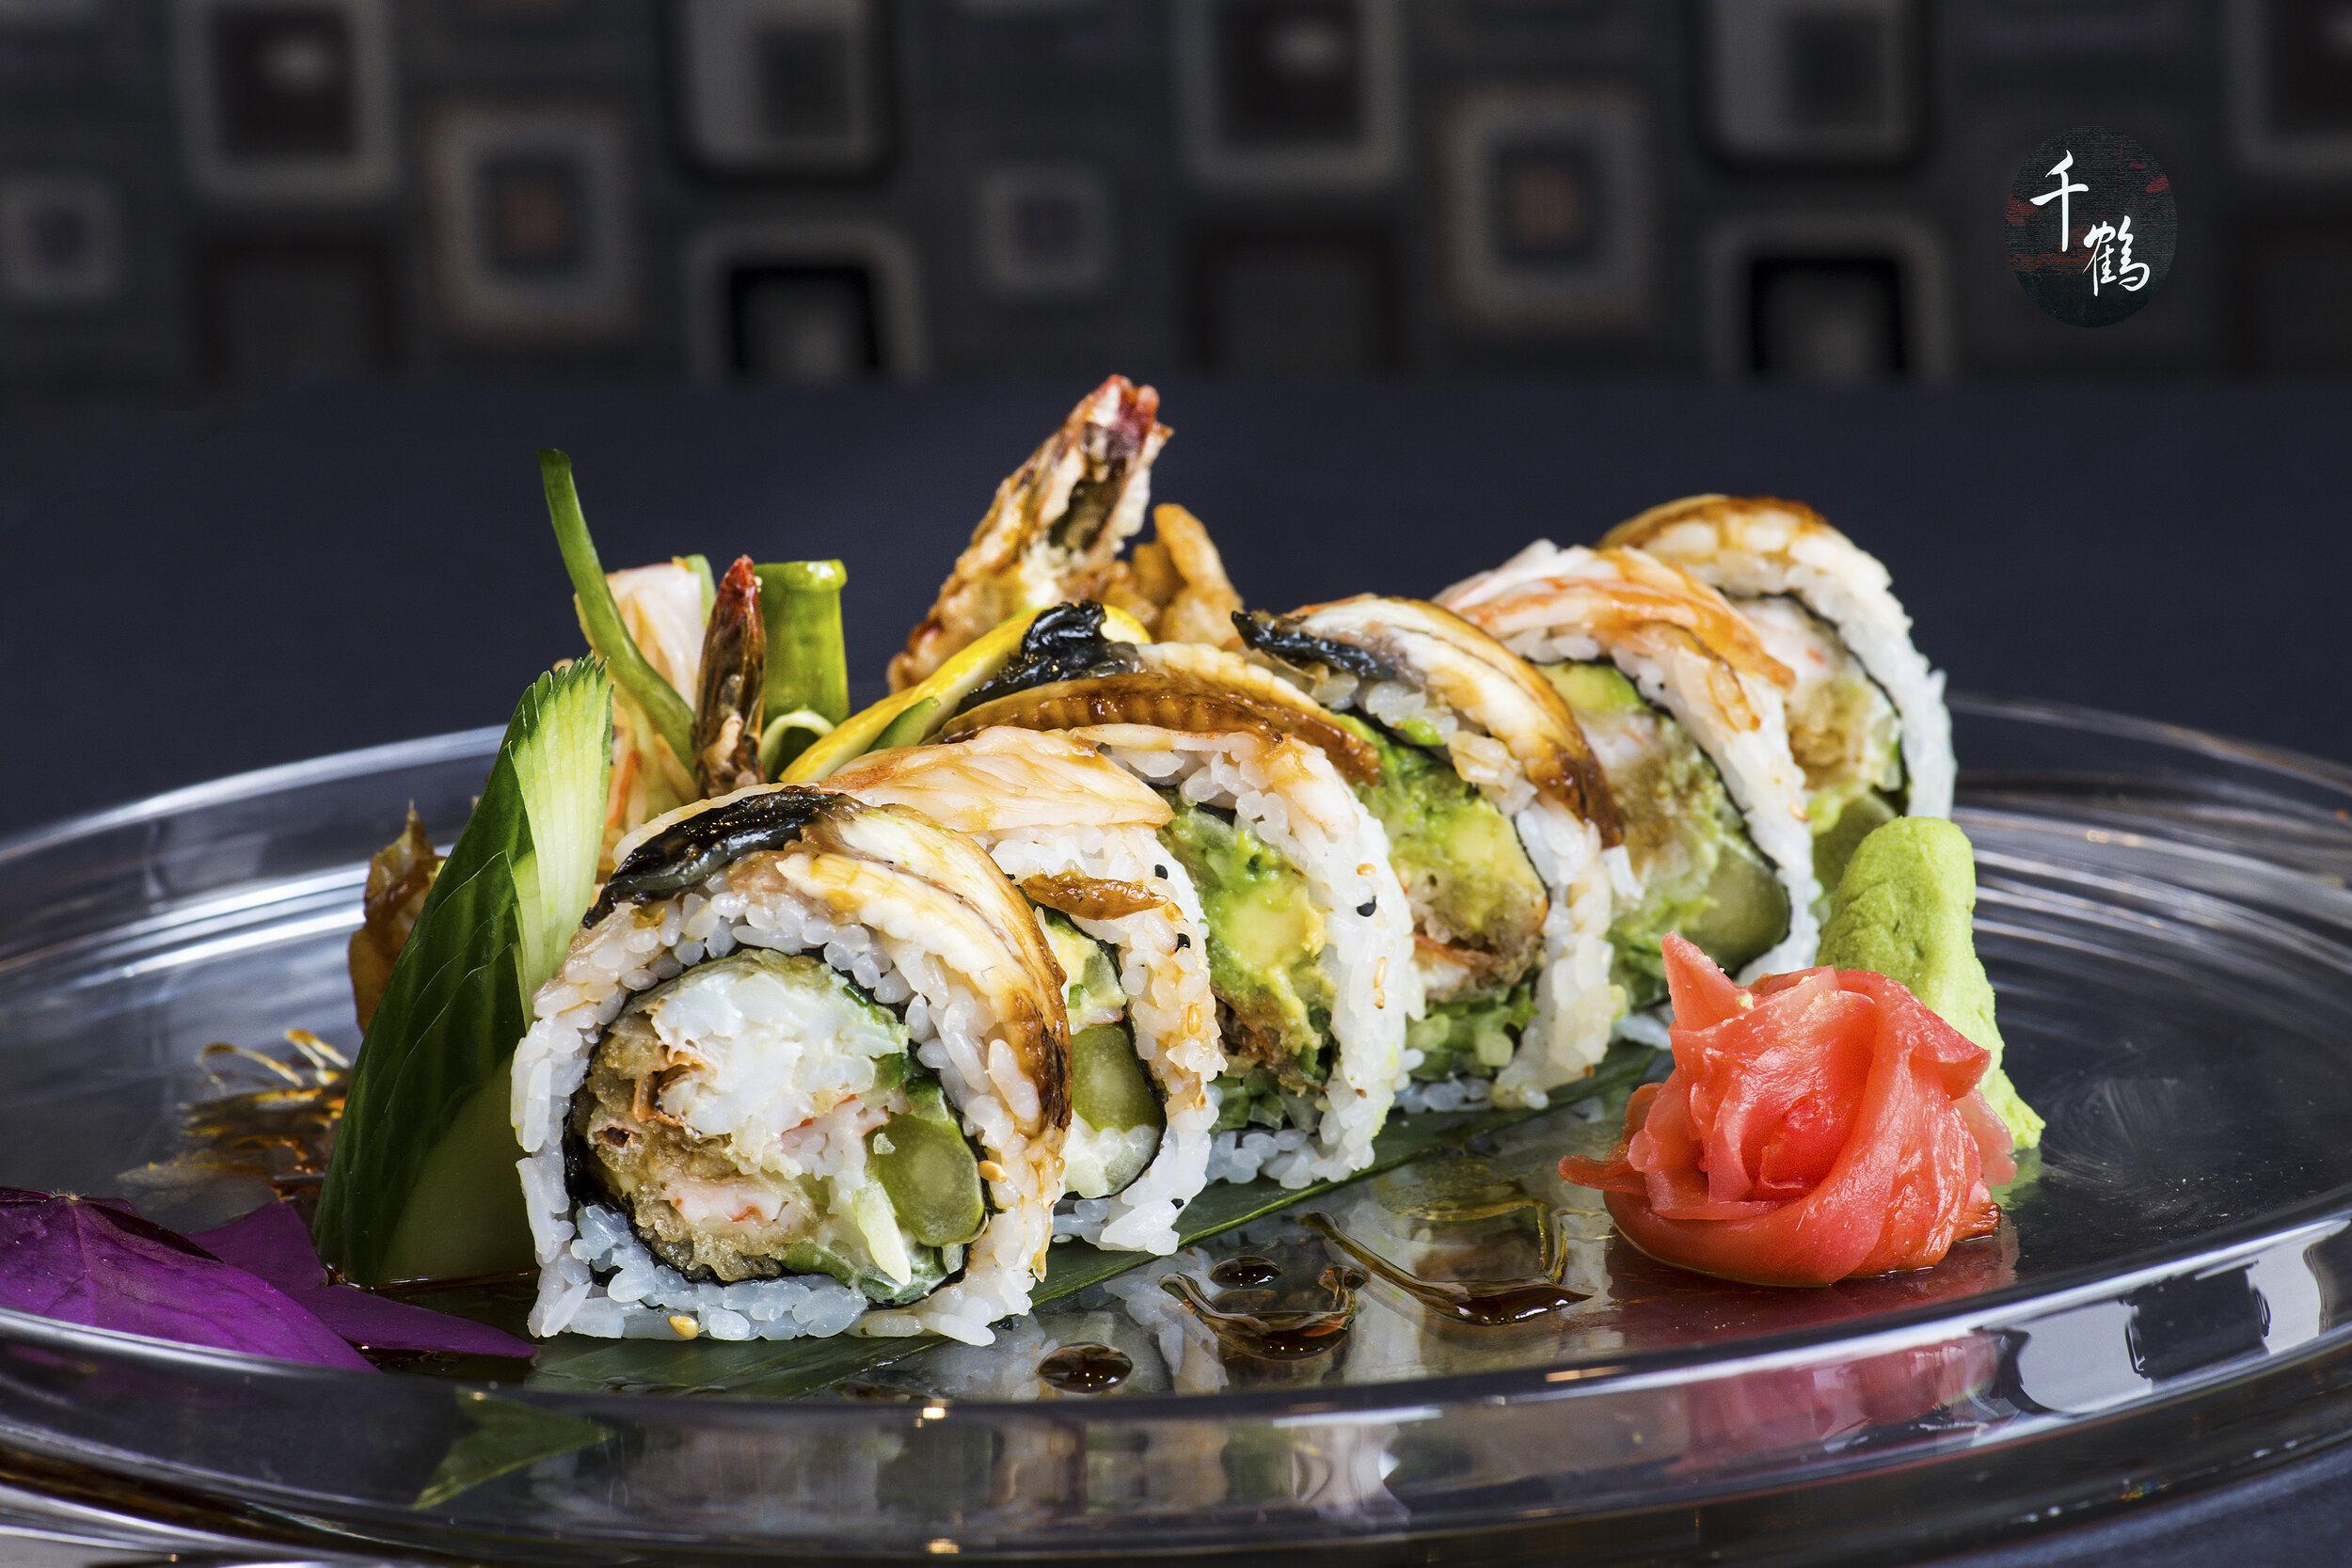 Phoenix Roll (8) $16.99 Soft Shell Crab, Tempura Shrimp, Avocado,  Cucumber, Asparagus, Fish Eggs, Spicy Mayo, Topped w Shrimp &Eel.